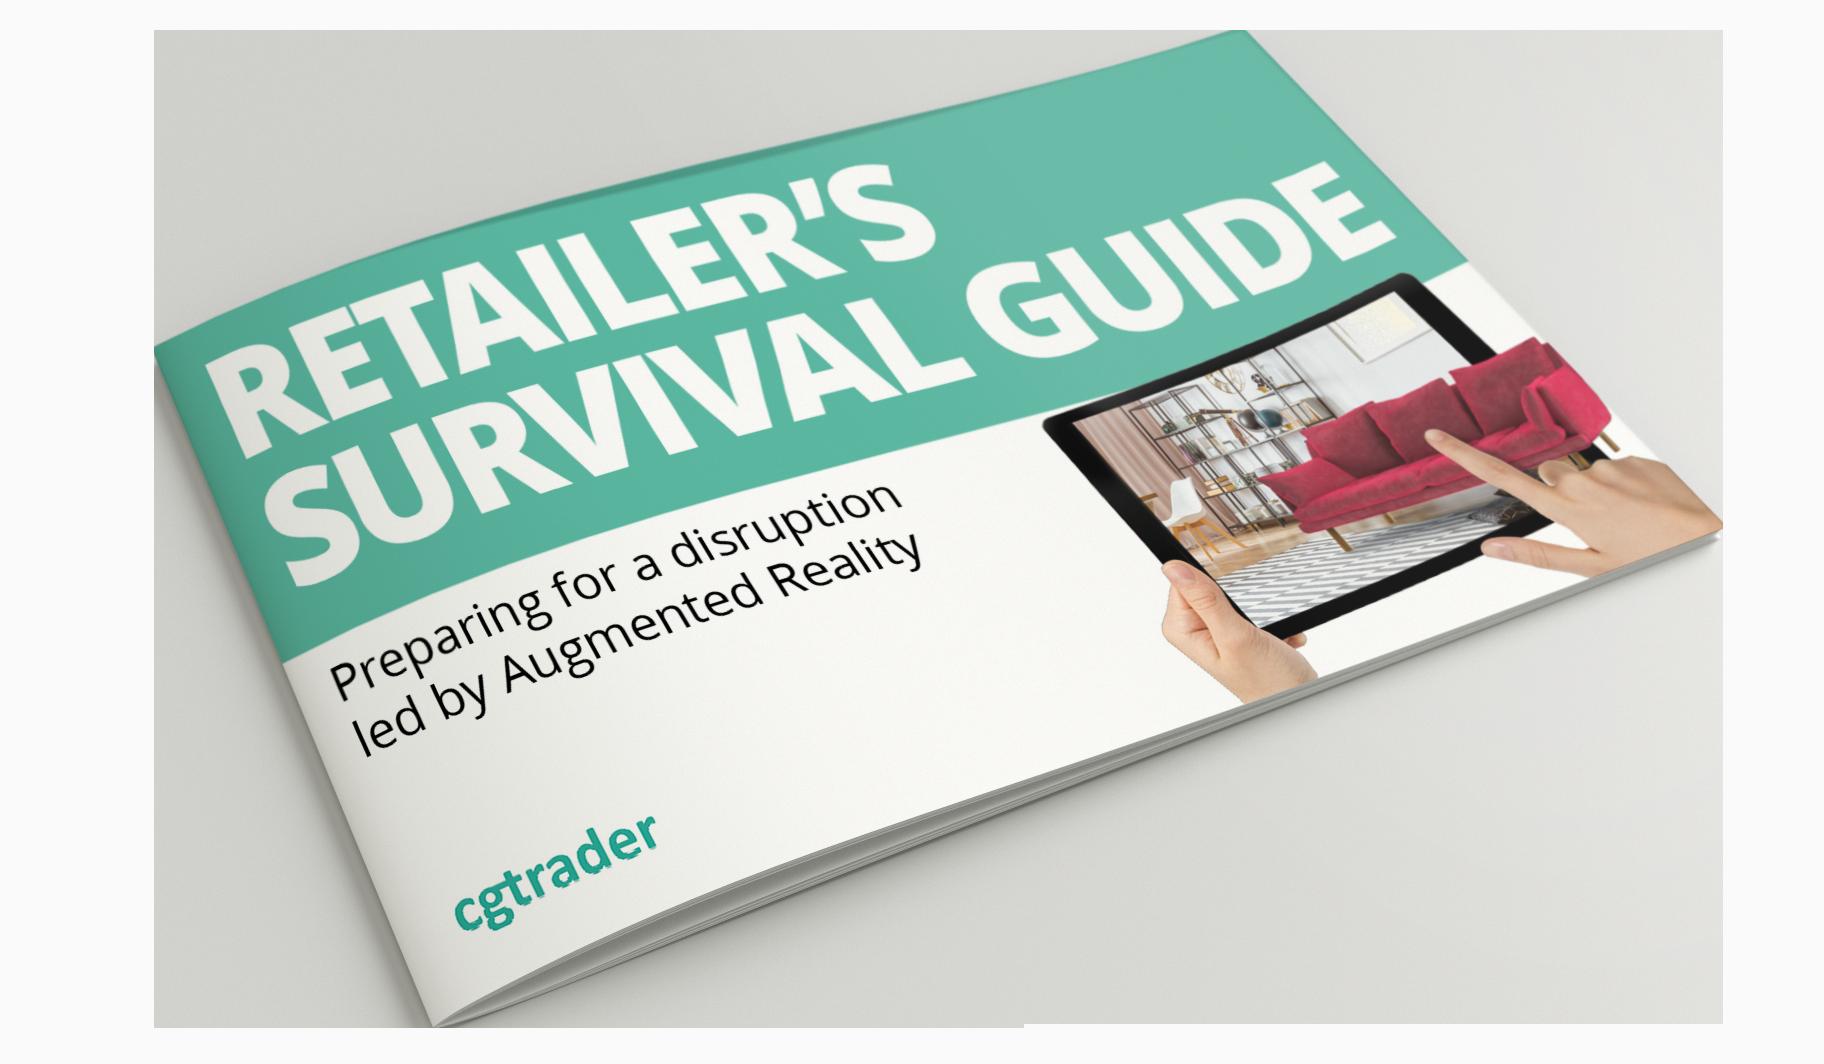 Retailers Survival Guide - CGTrader